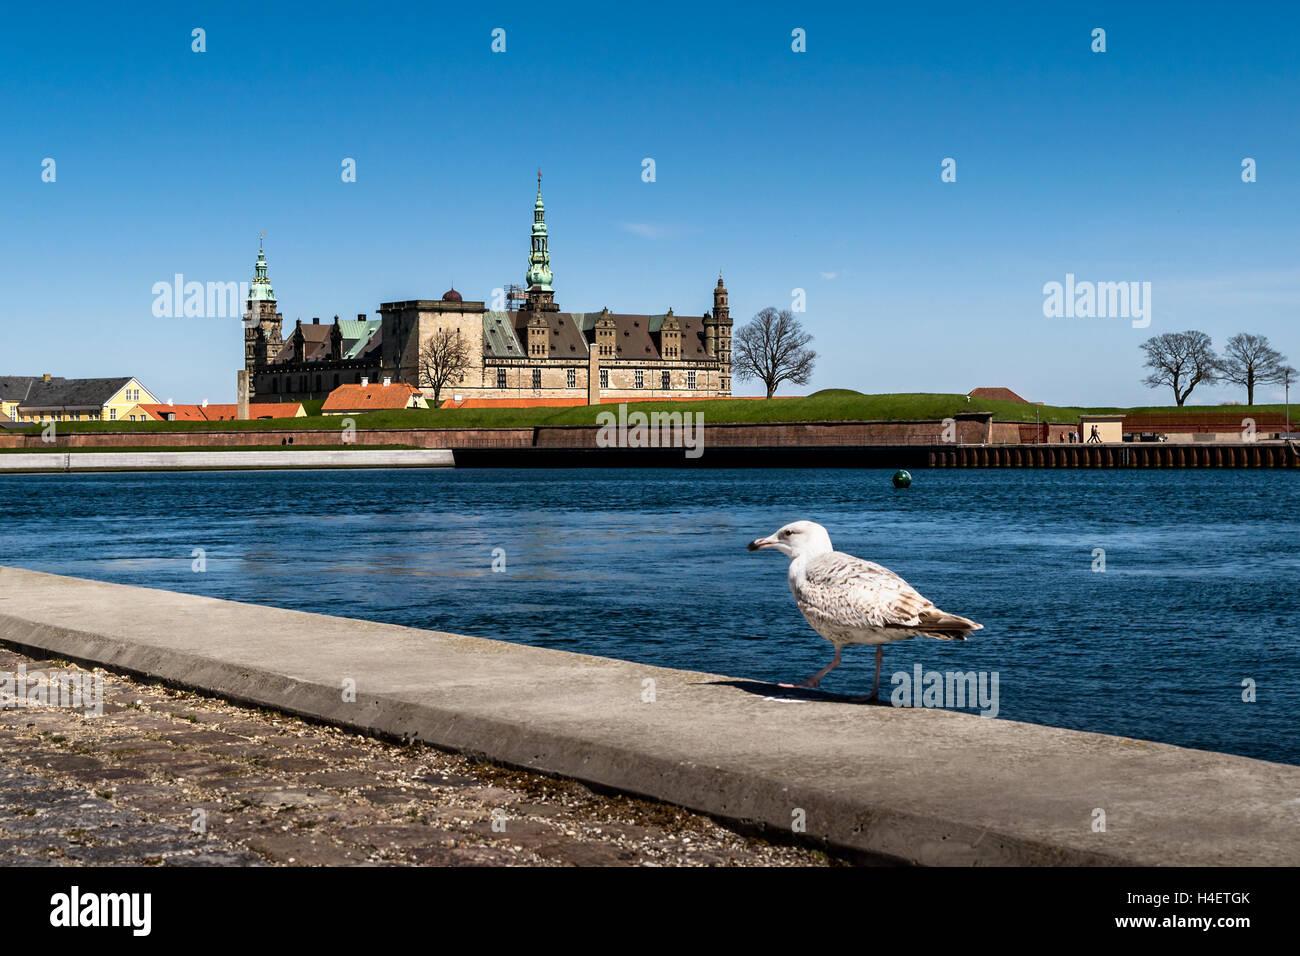 Kronborg Castle, residence of Hamlet, with a seagull in vew, settled in a town Helsingor, north of Copenhagen, Denmark - Stock Image